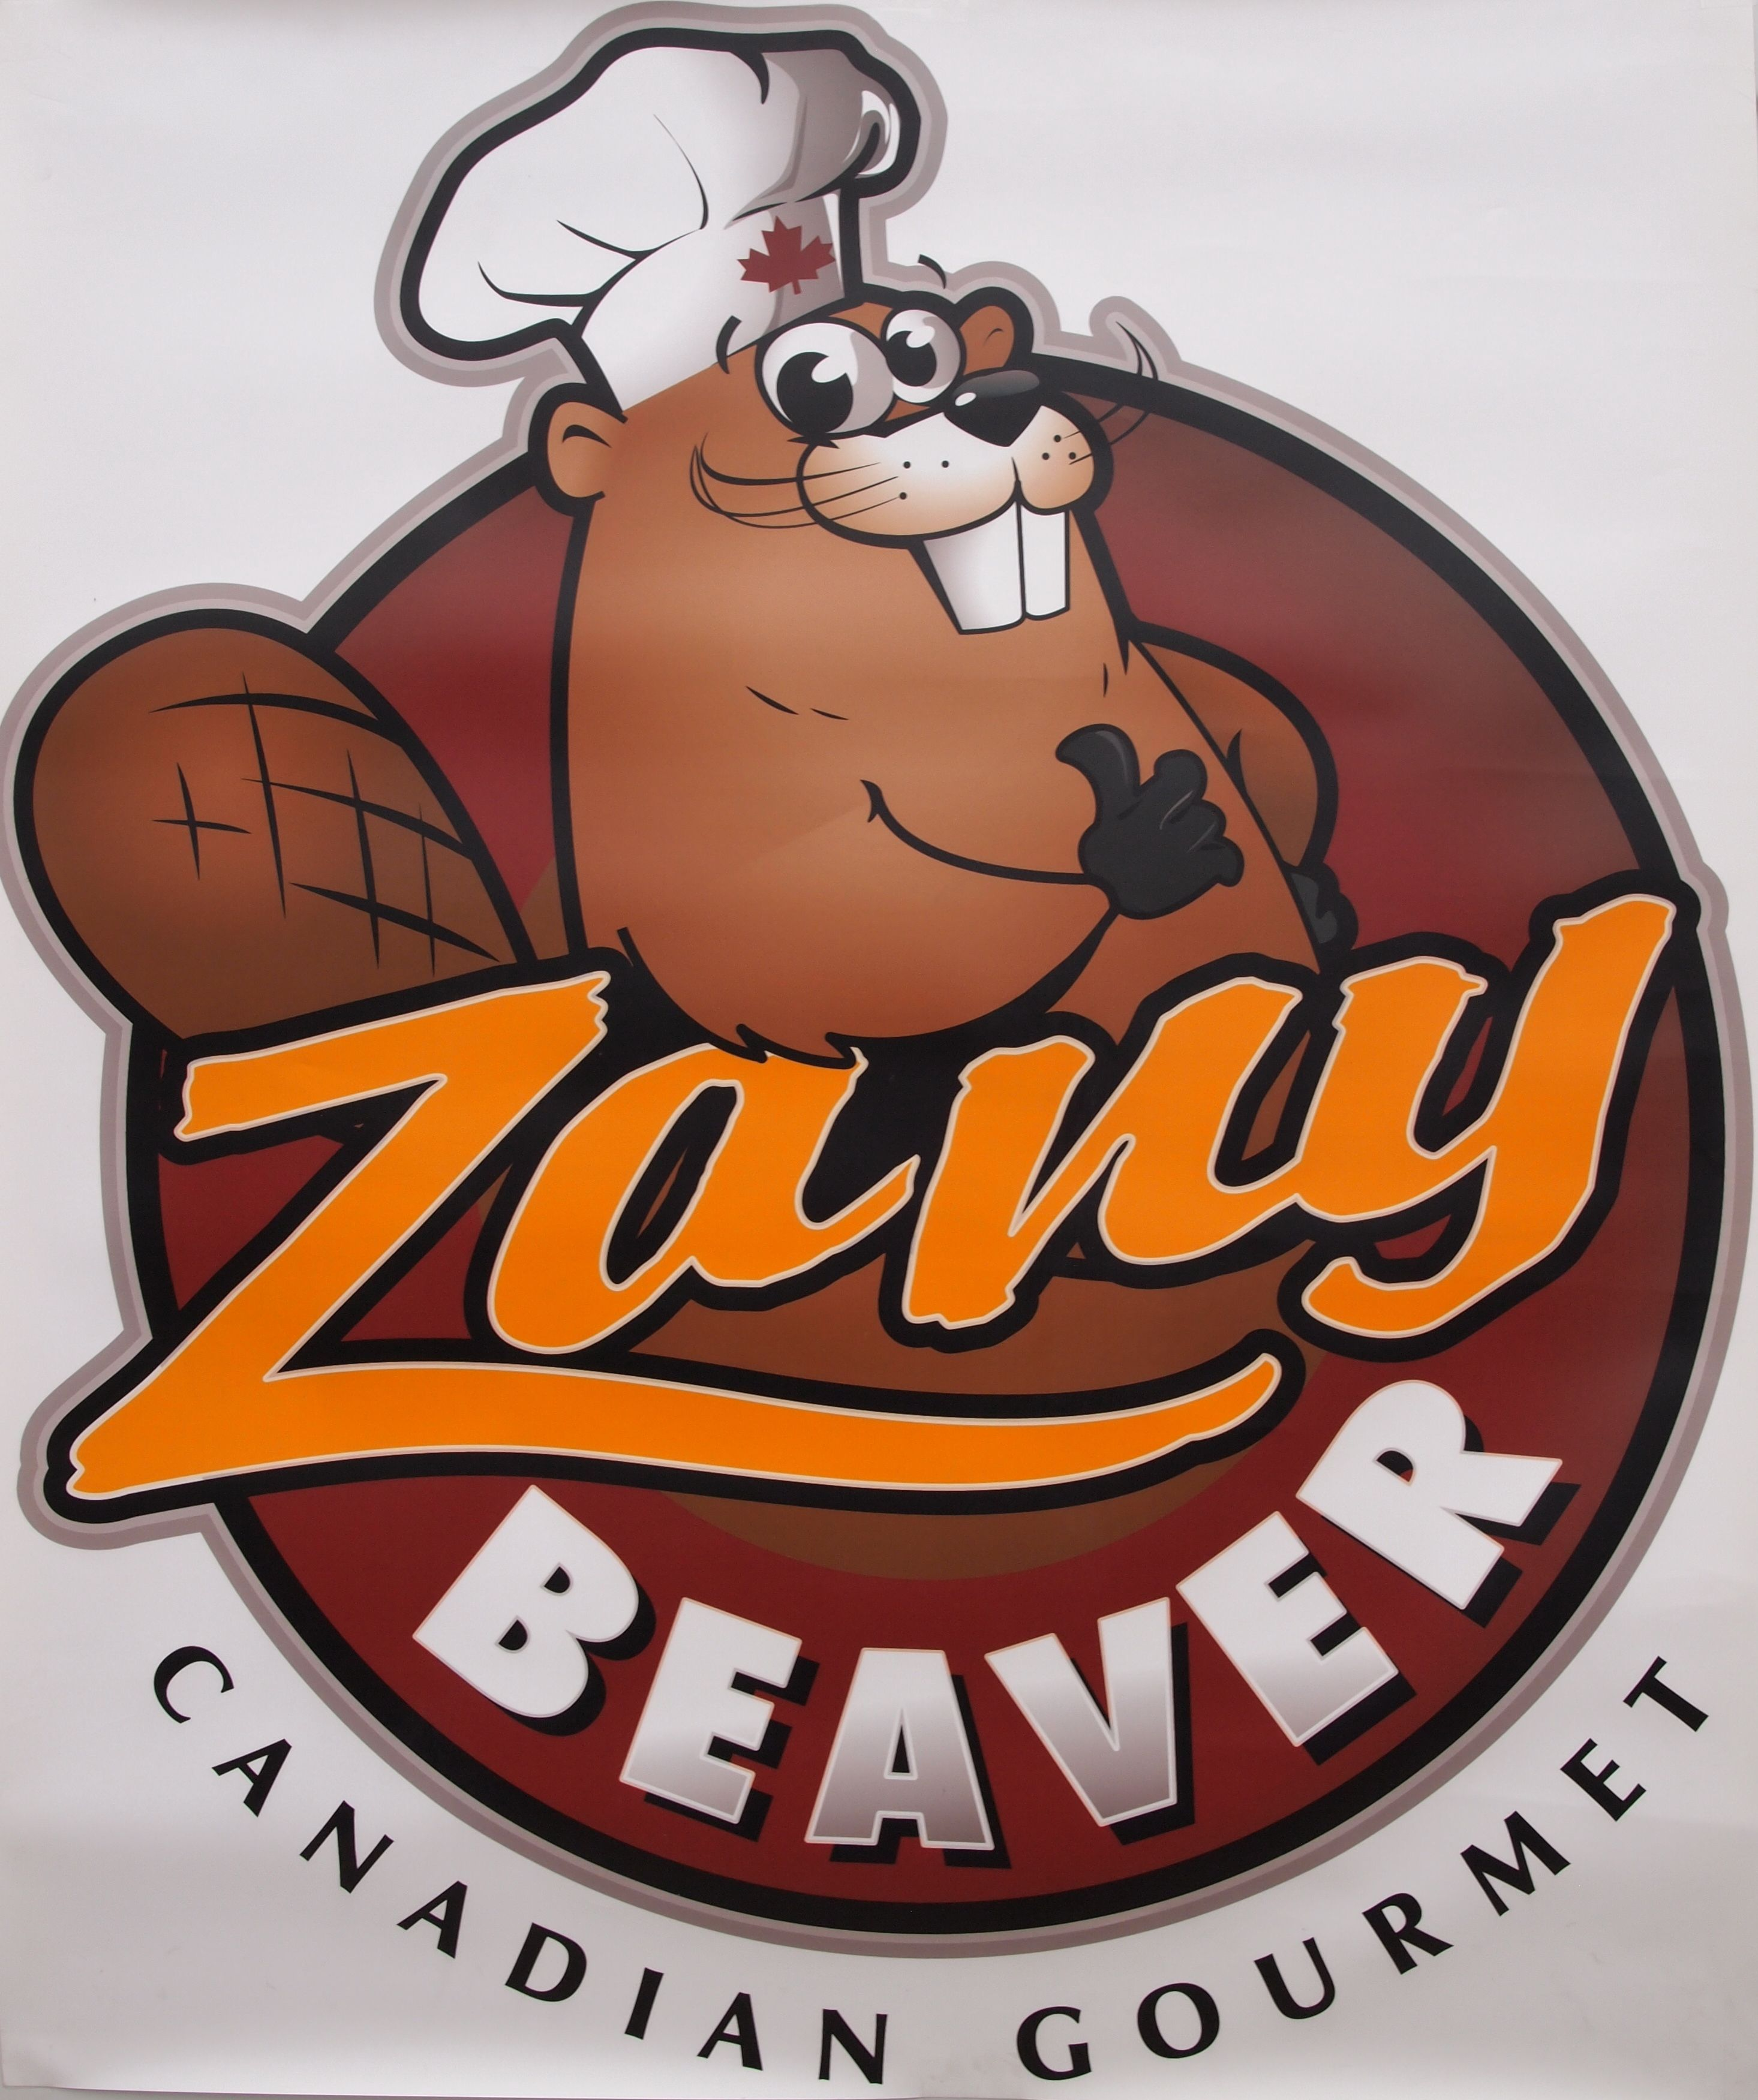 ZanyBeaver logo and mascot foodtruck poutine Tucson